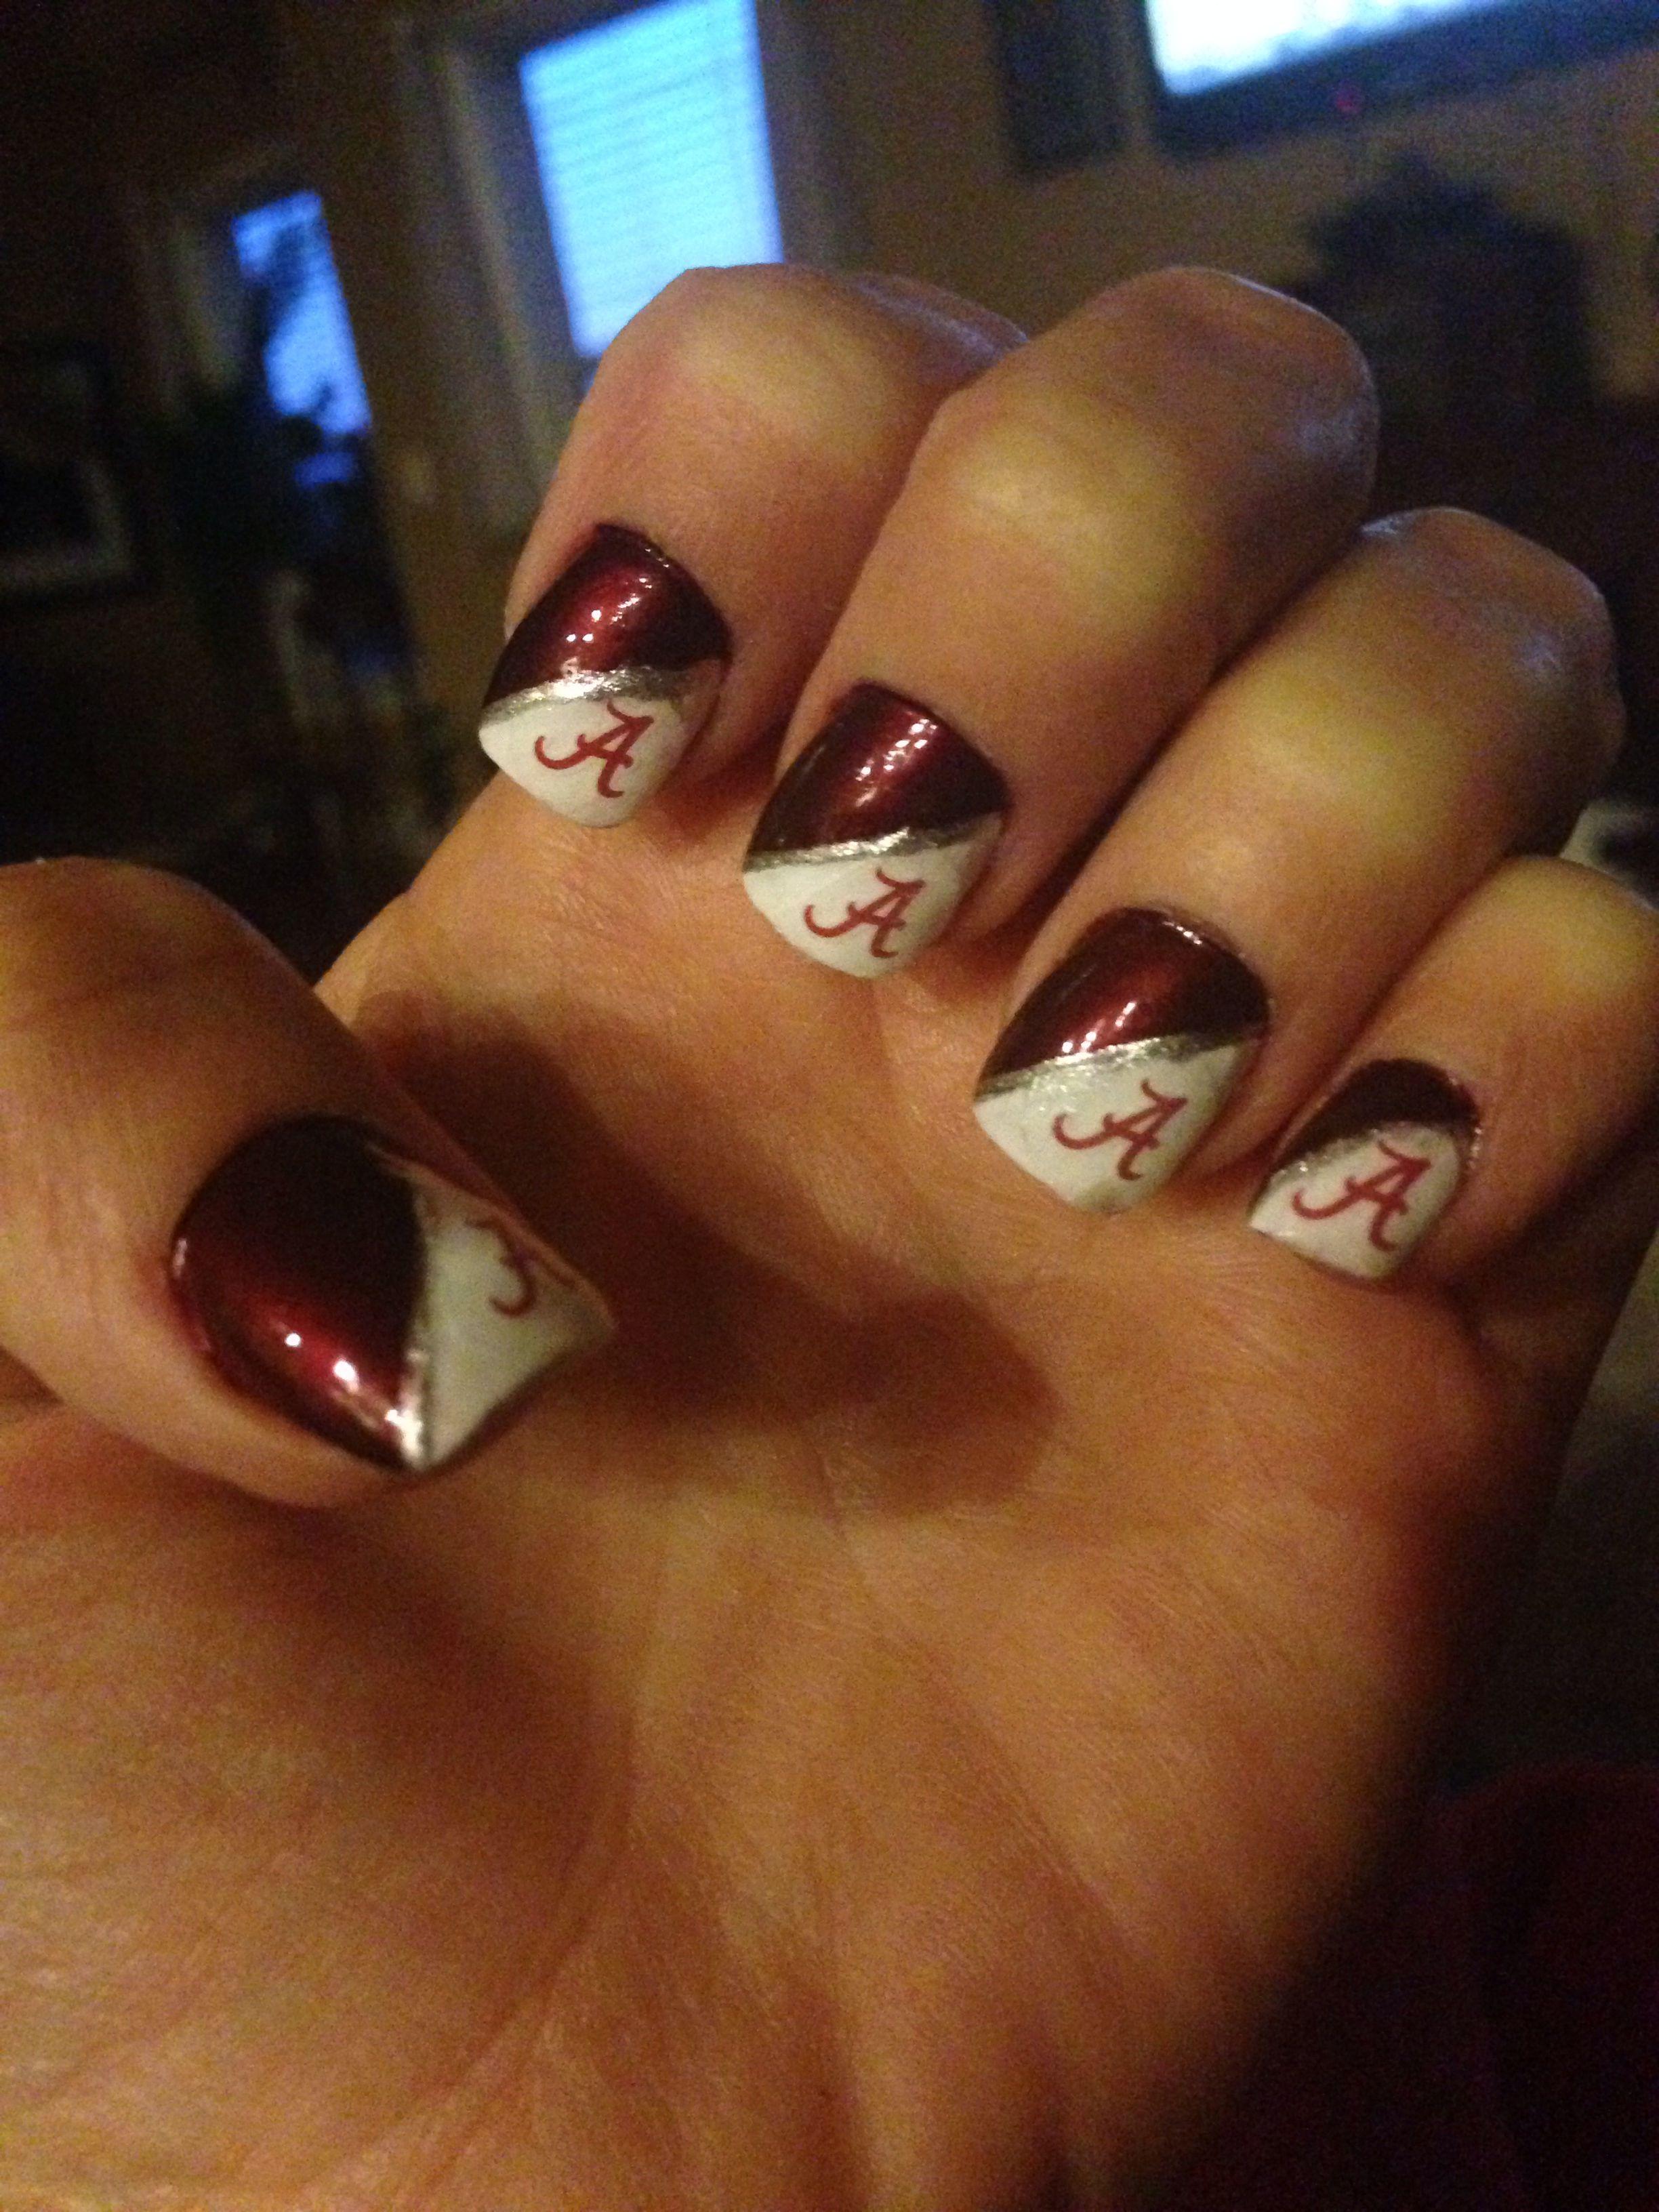 Nail Design For The Alabama Crimson Tide S Season Opener Against West Virginia Roll